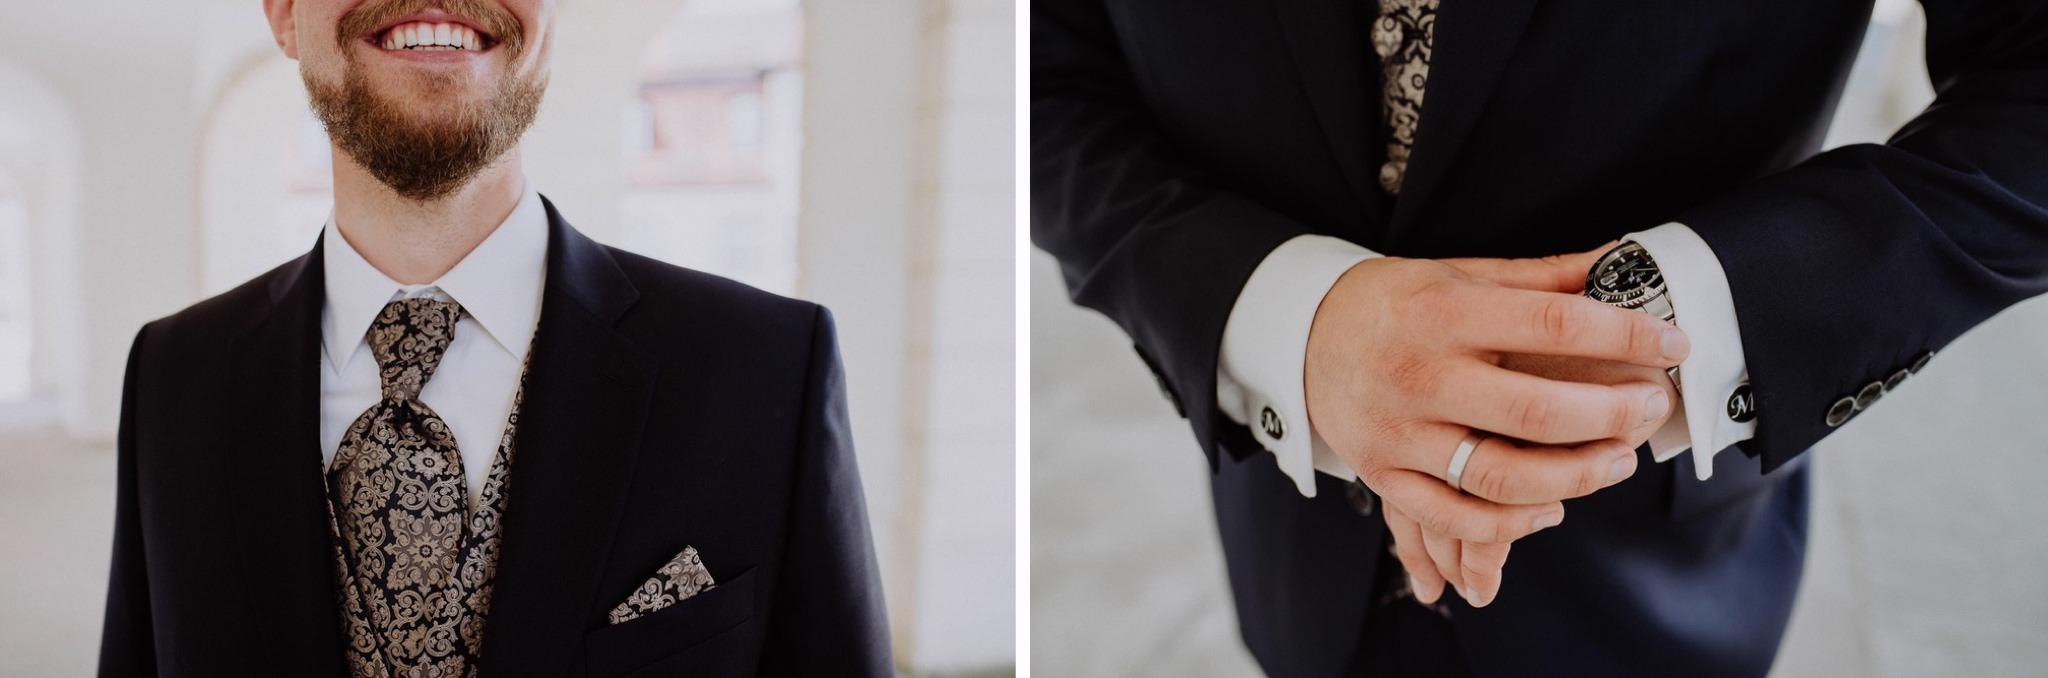 wedding photographer hamilton new zealand 1020 1